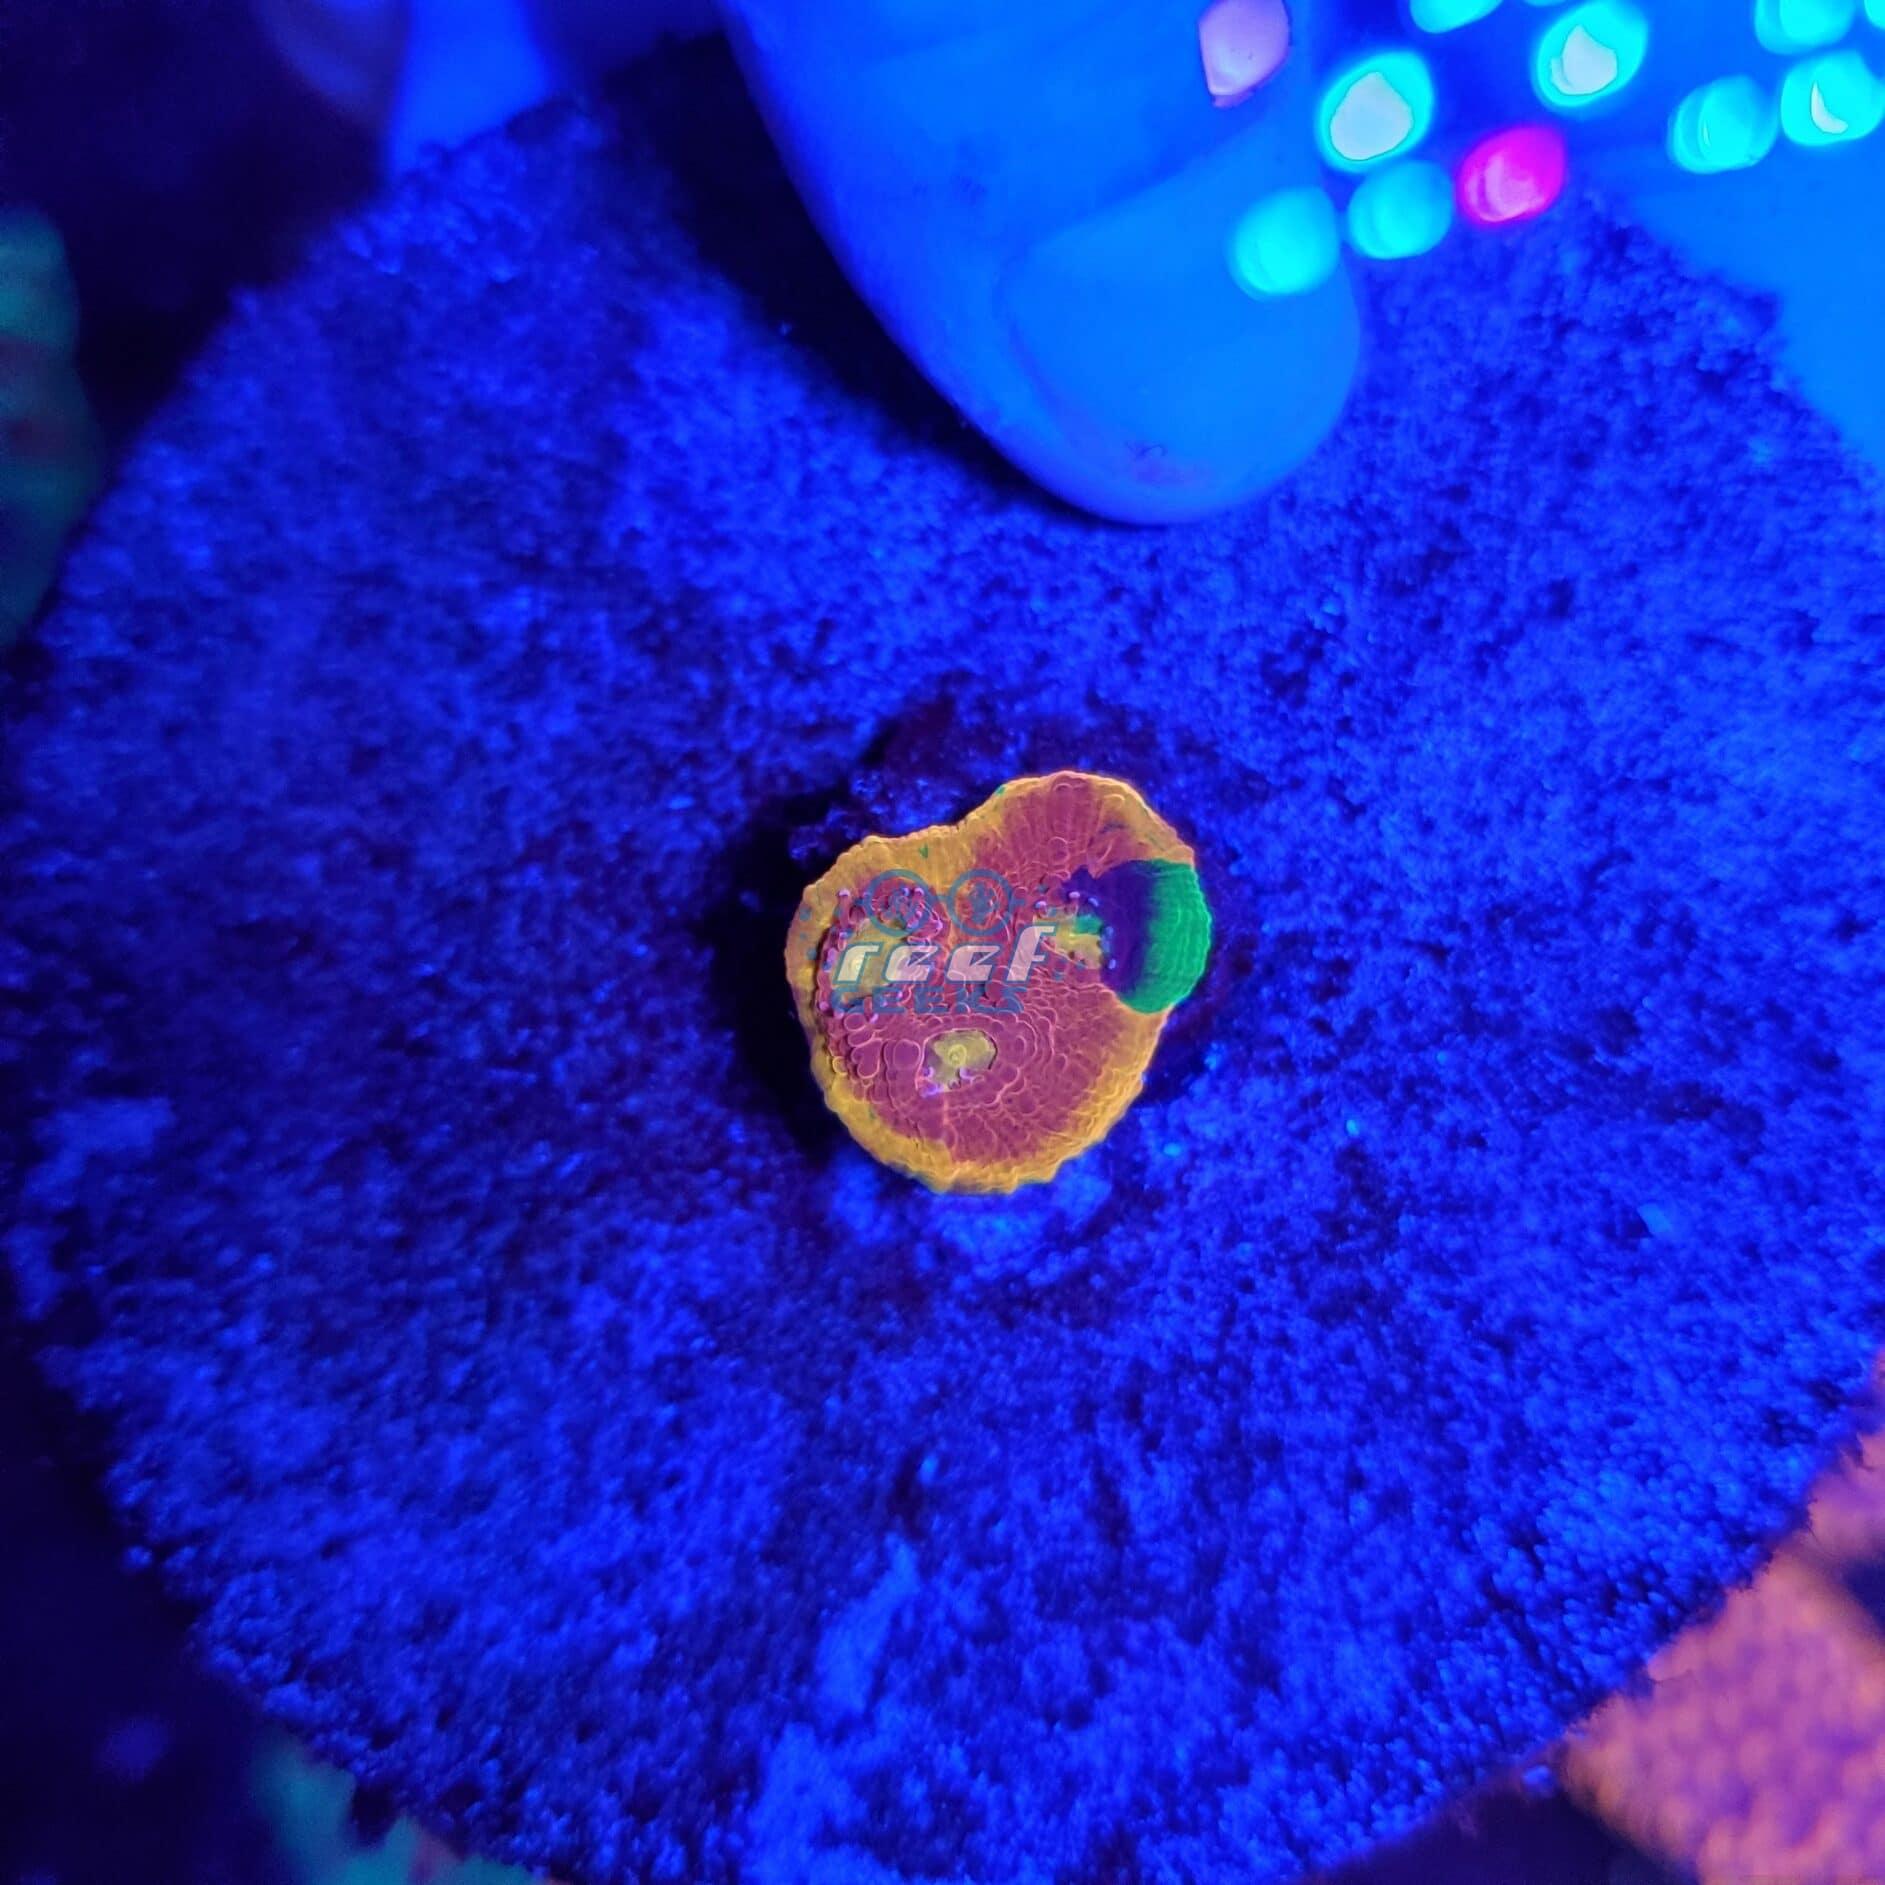 Rainbow Chalice WYSIWYG